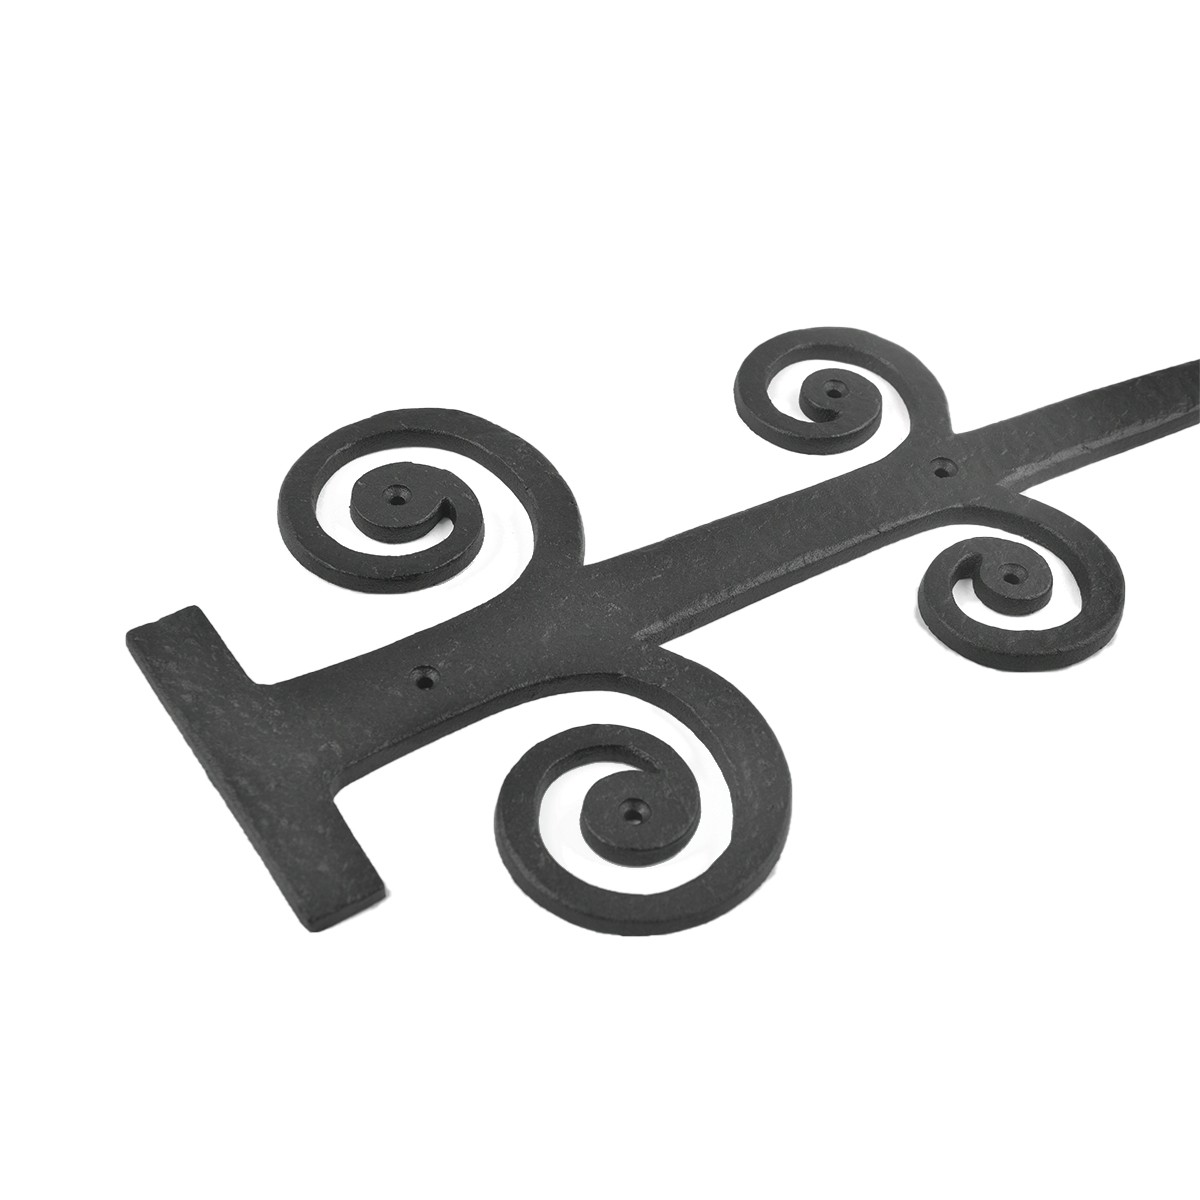 10 Decorative Heavy Iron Door Strap Hinge Spade 16 Long wrought iron strap hinge door strap hinge decor decorative door strap hinge iron